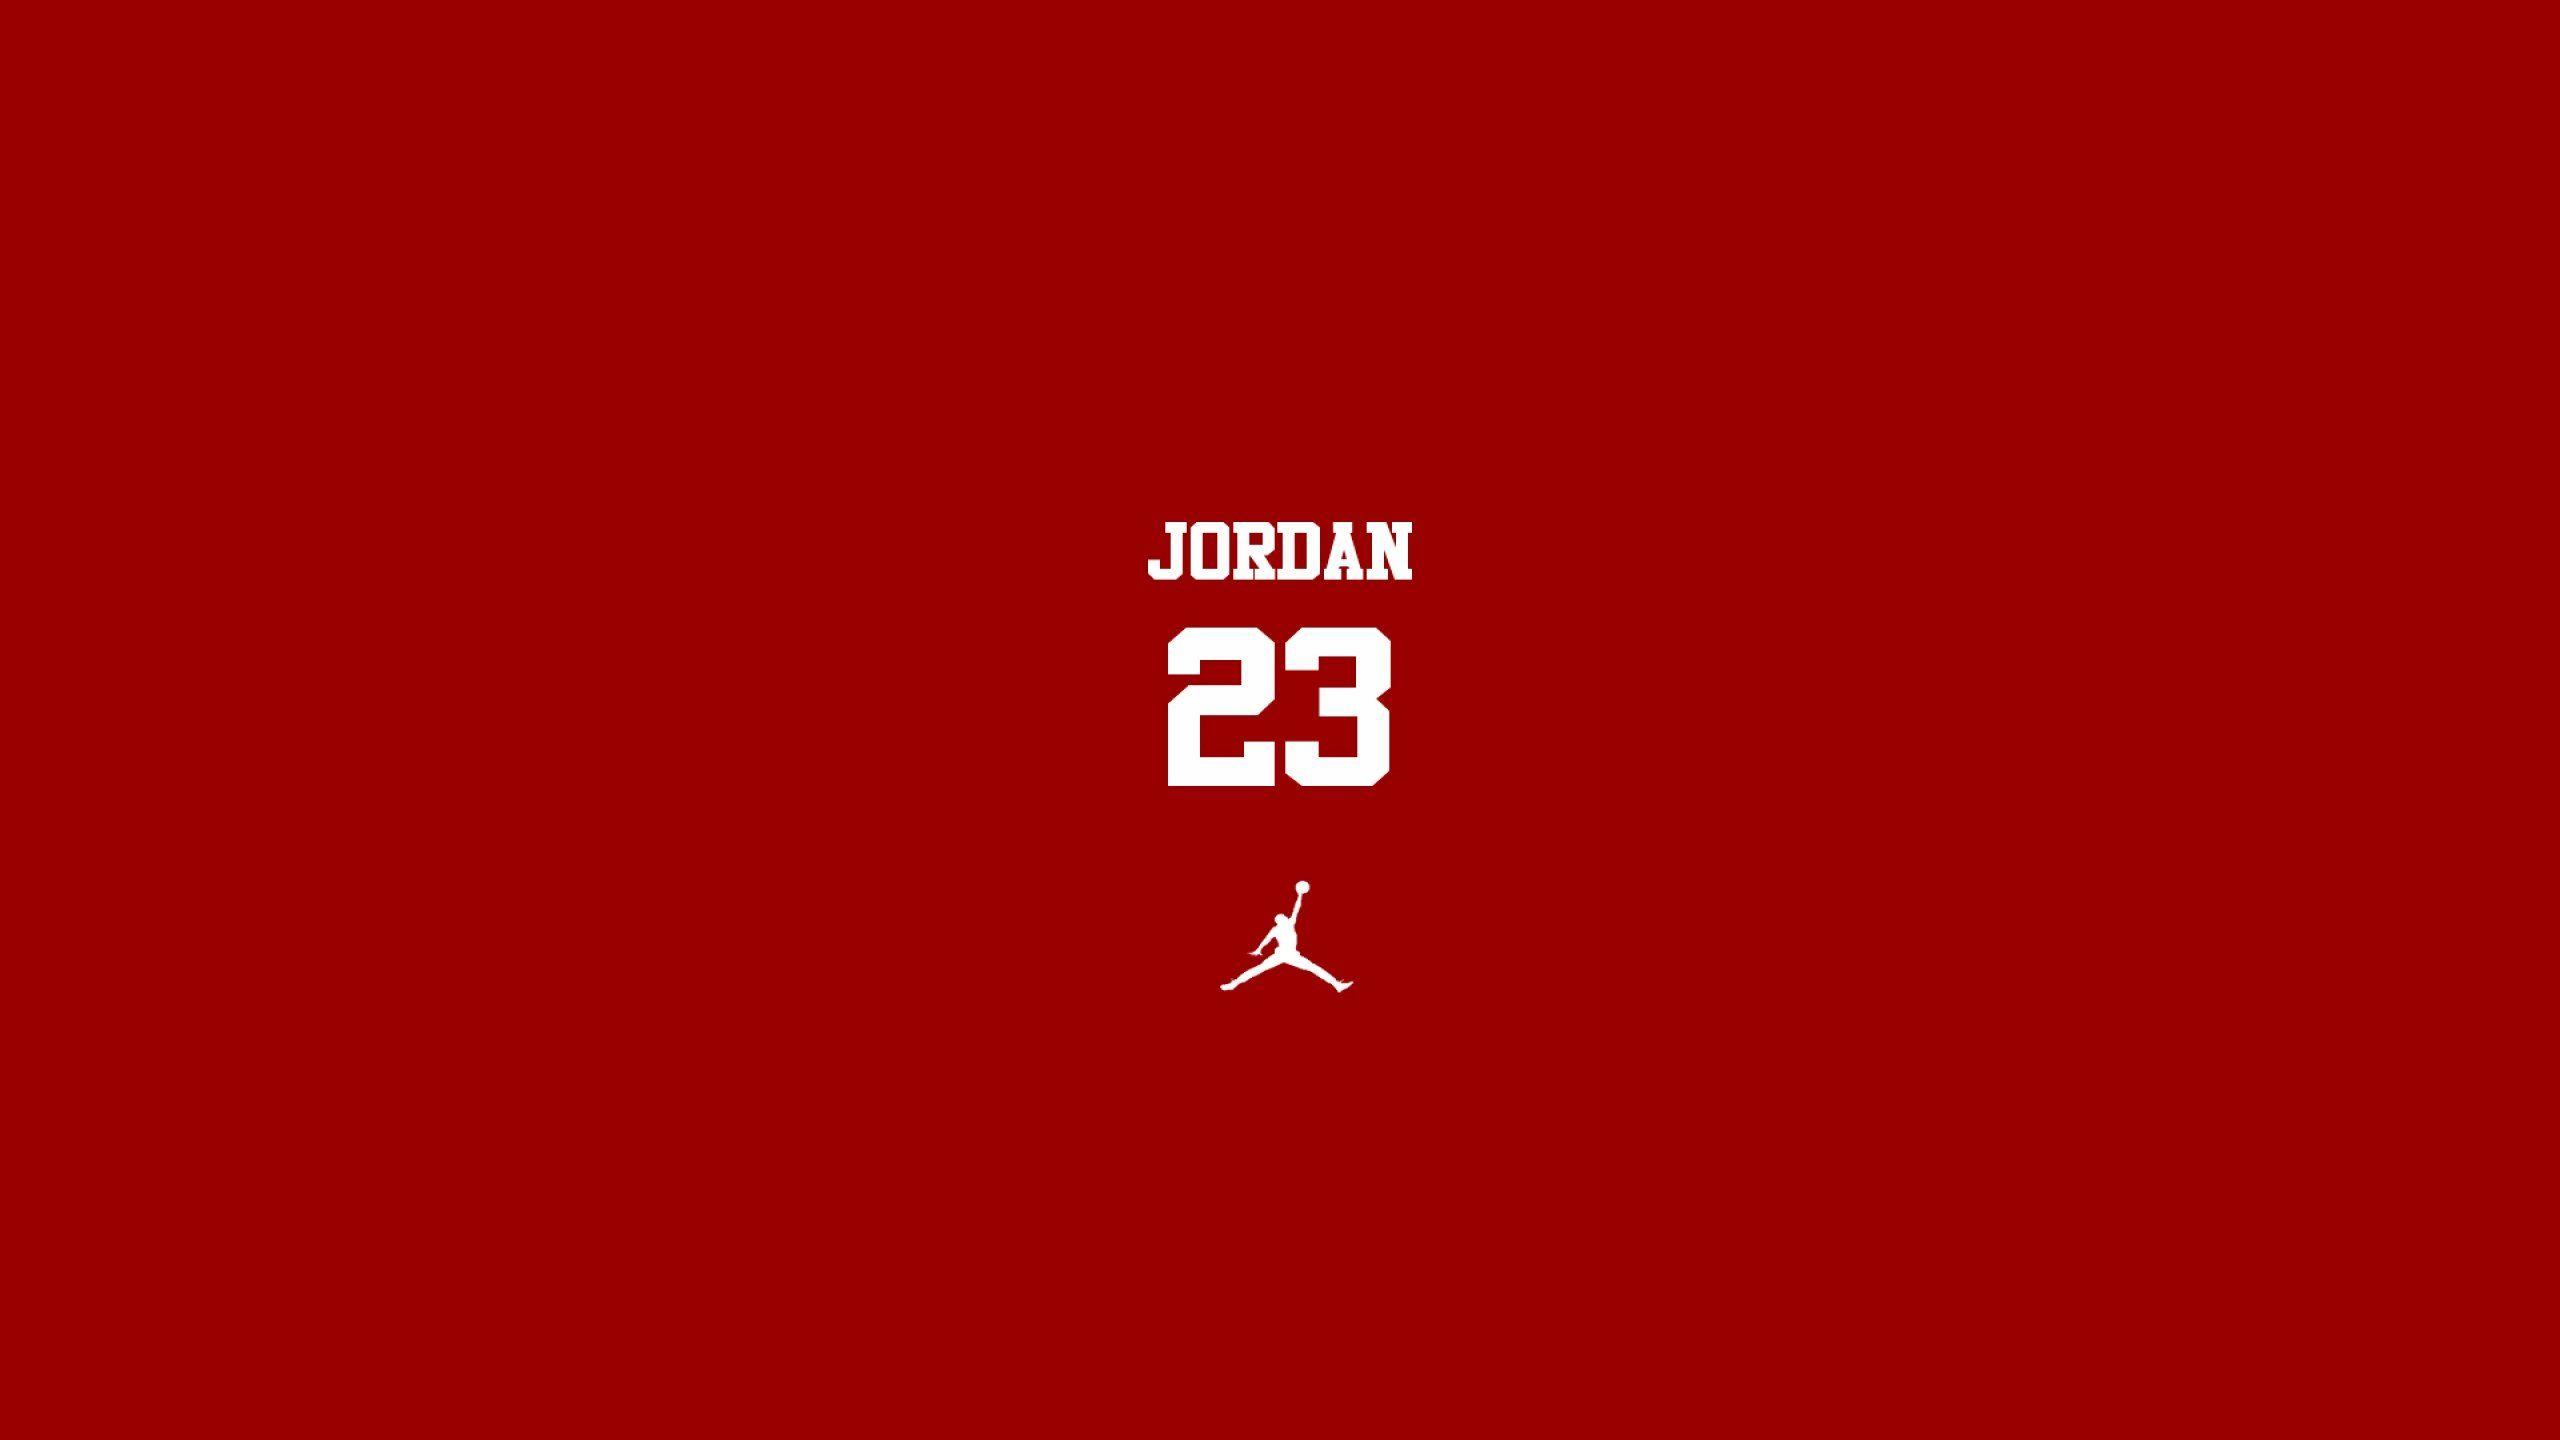 Sfondo Jordan Iphone reformwiorg 2560x1440